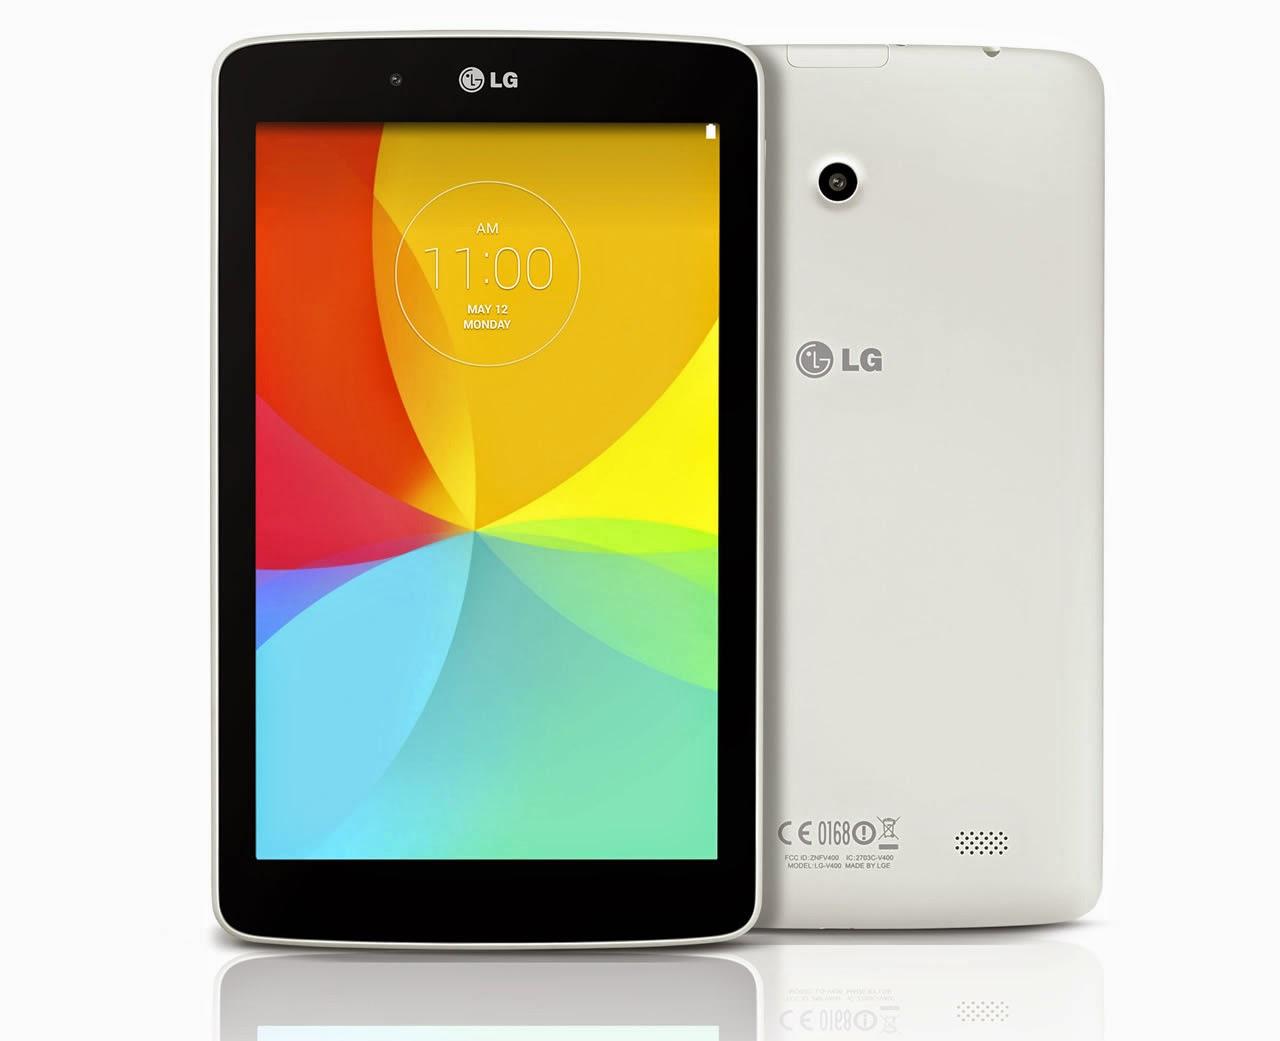 Harga Dan Spesifikasi LG G Pad 80 LTE Tablet KitKat 4G